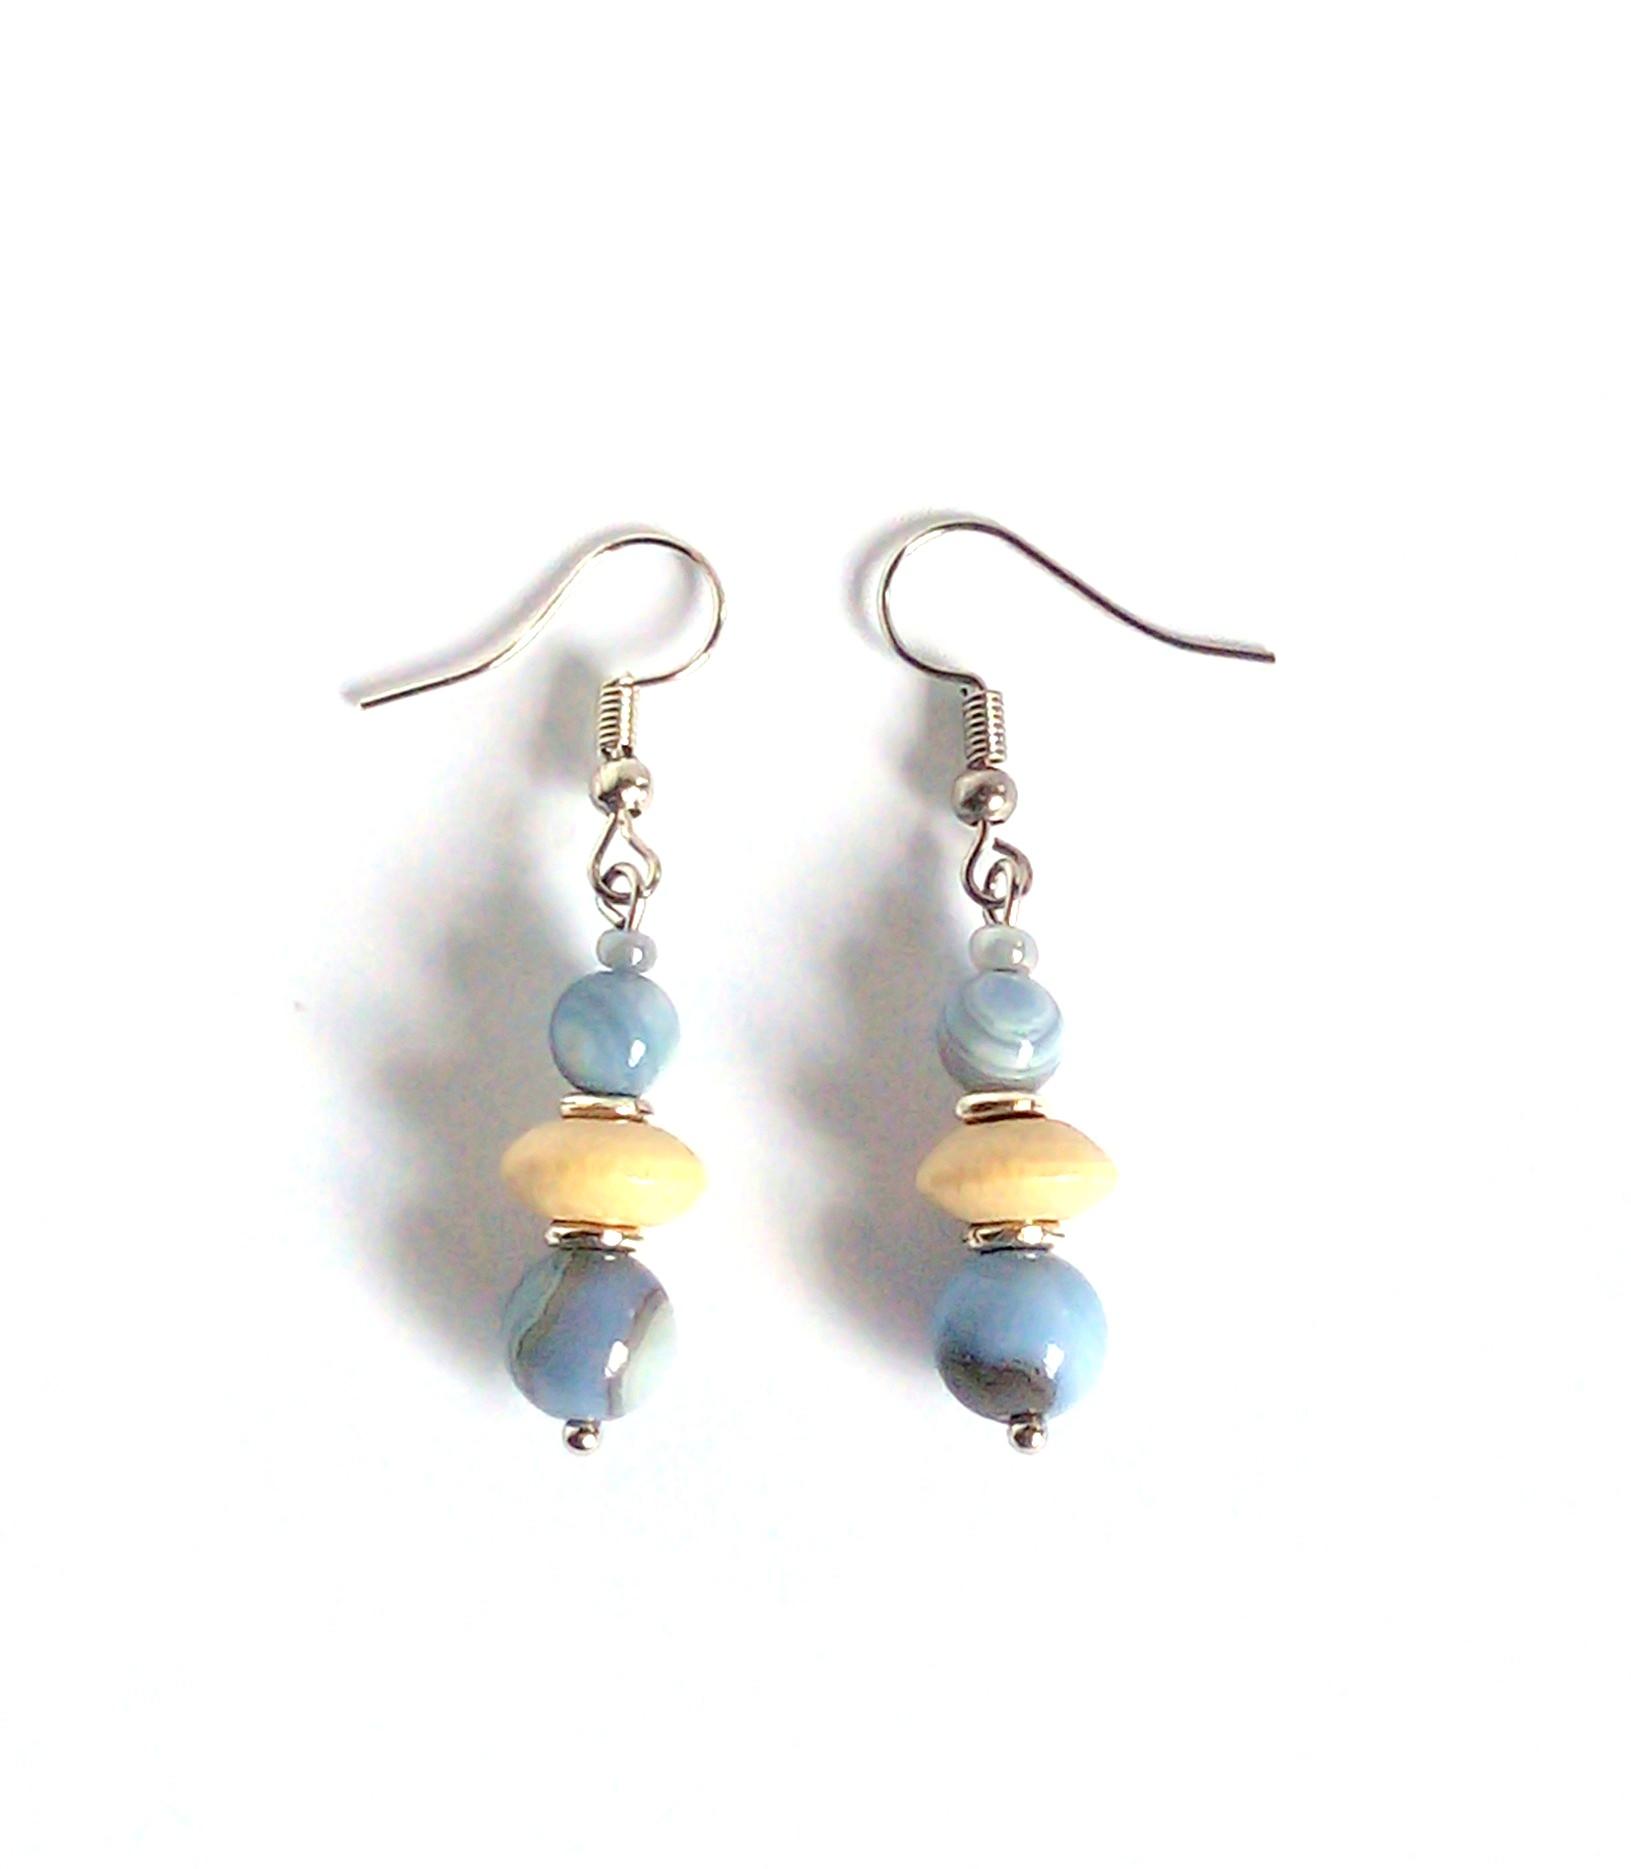 Blue/grey agates and cream wood earrings